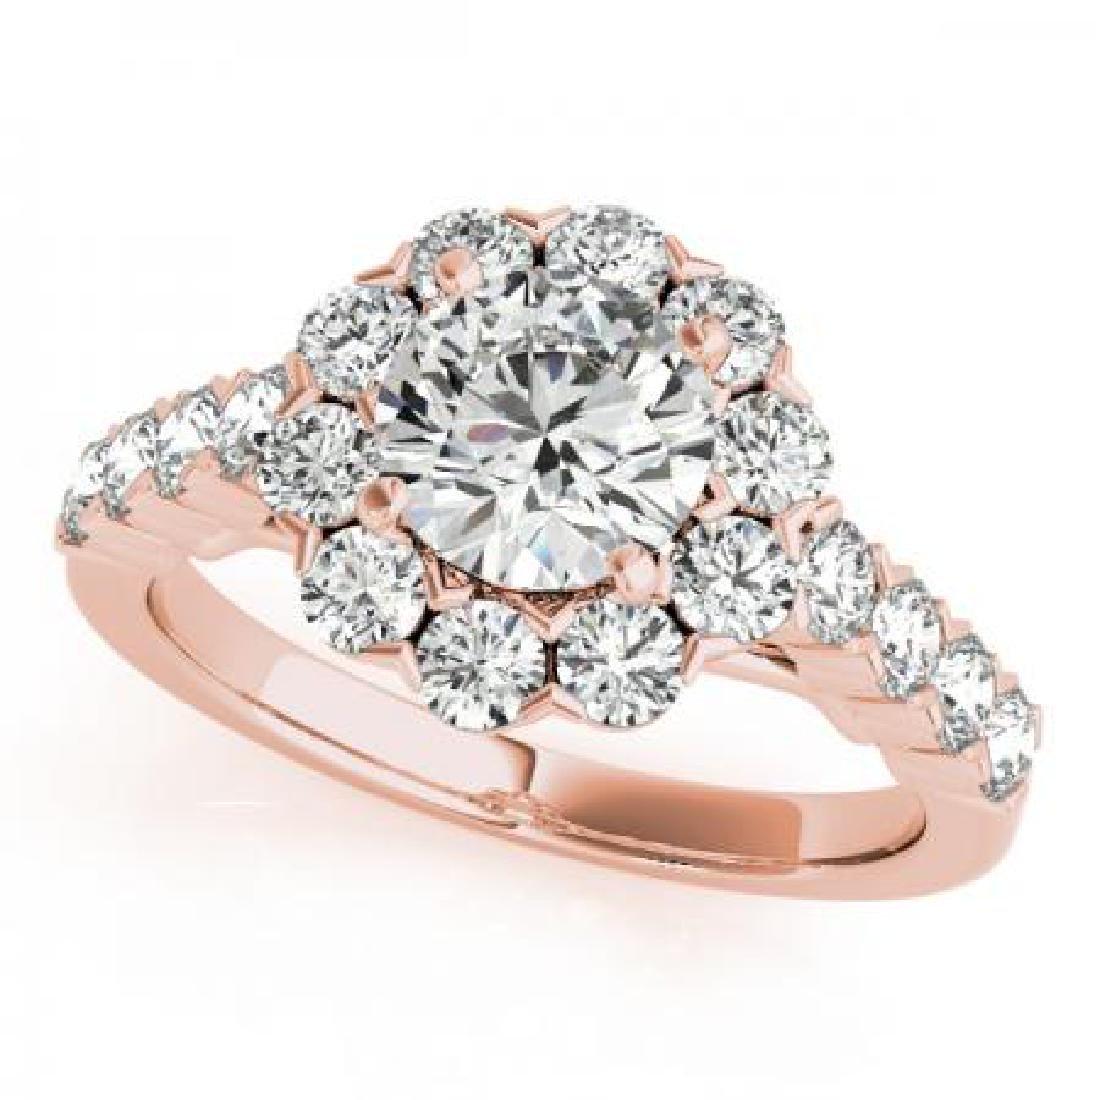 CERTIFIED 14KT ROSE GOLD 1.12 CT G-H/VS-SI1 DIAMOND HAL